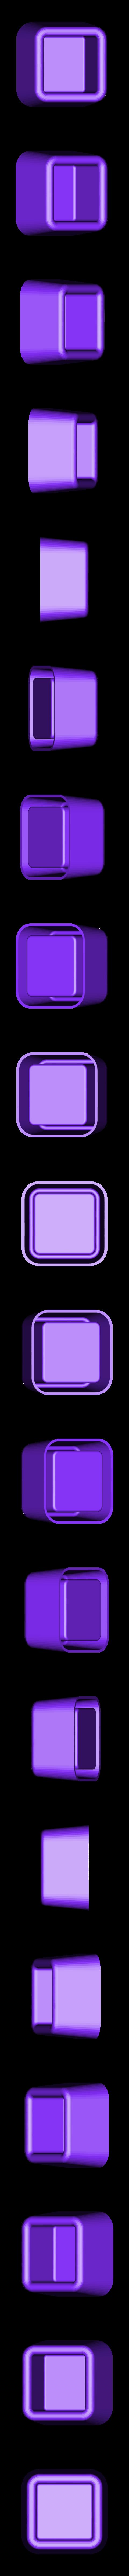 Dodge_Caravan_Van_Container.stl Download free STL file Minivan Container / Receptacle • 3D printing template, itech3dp